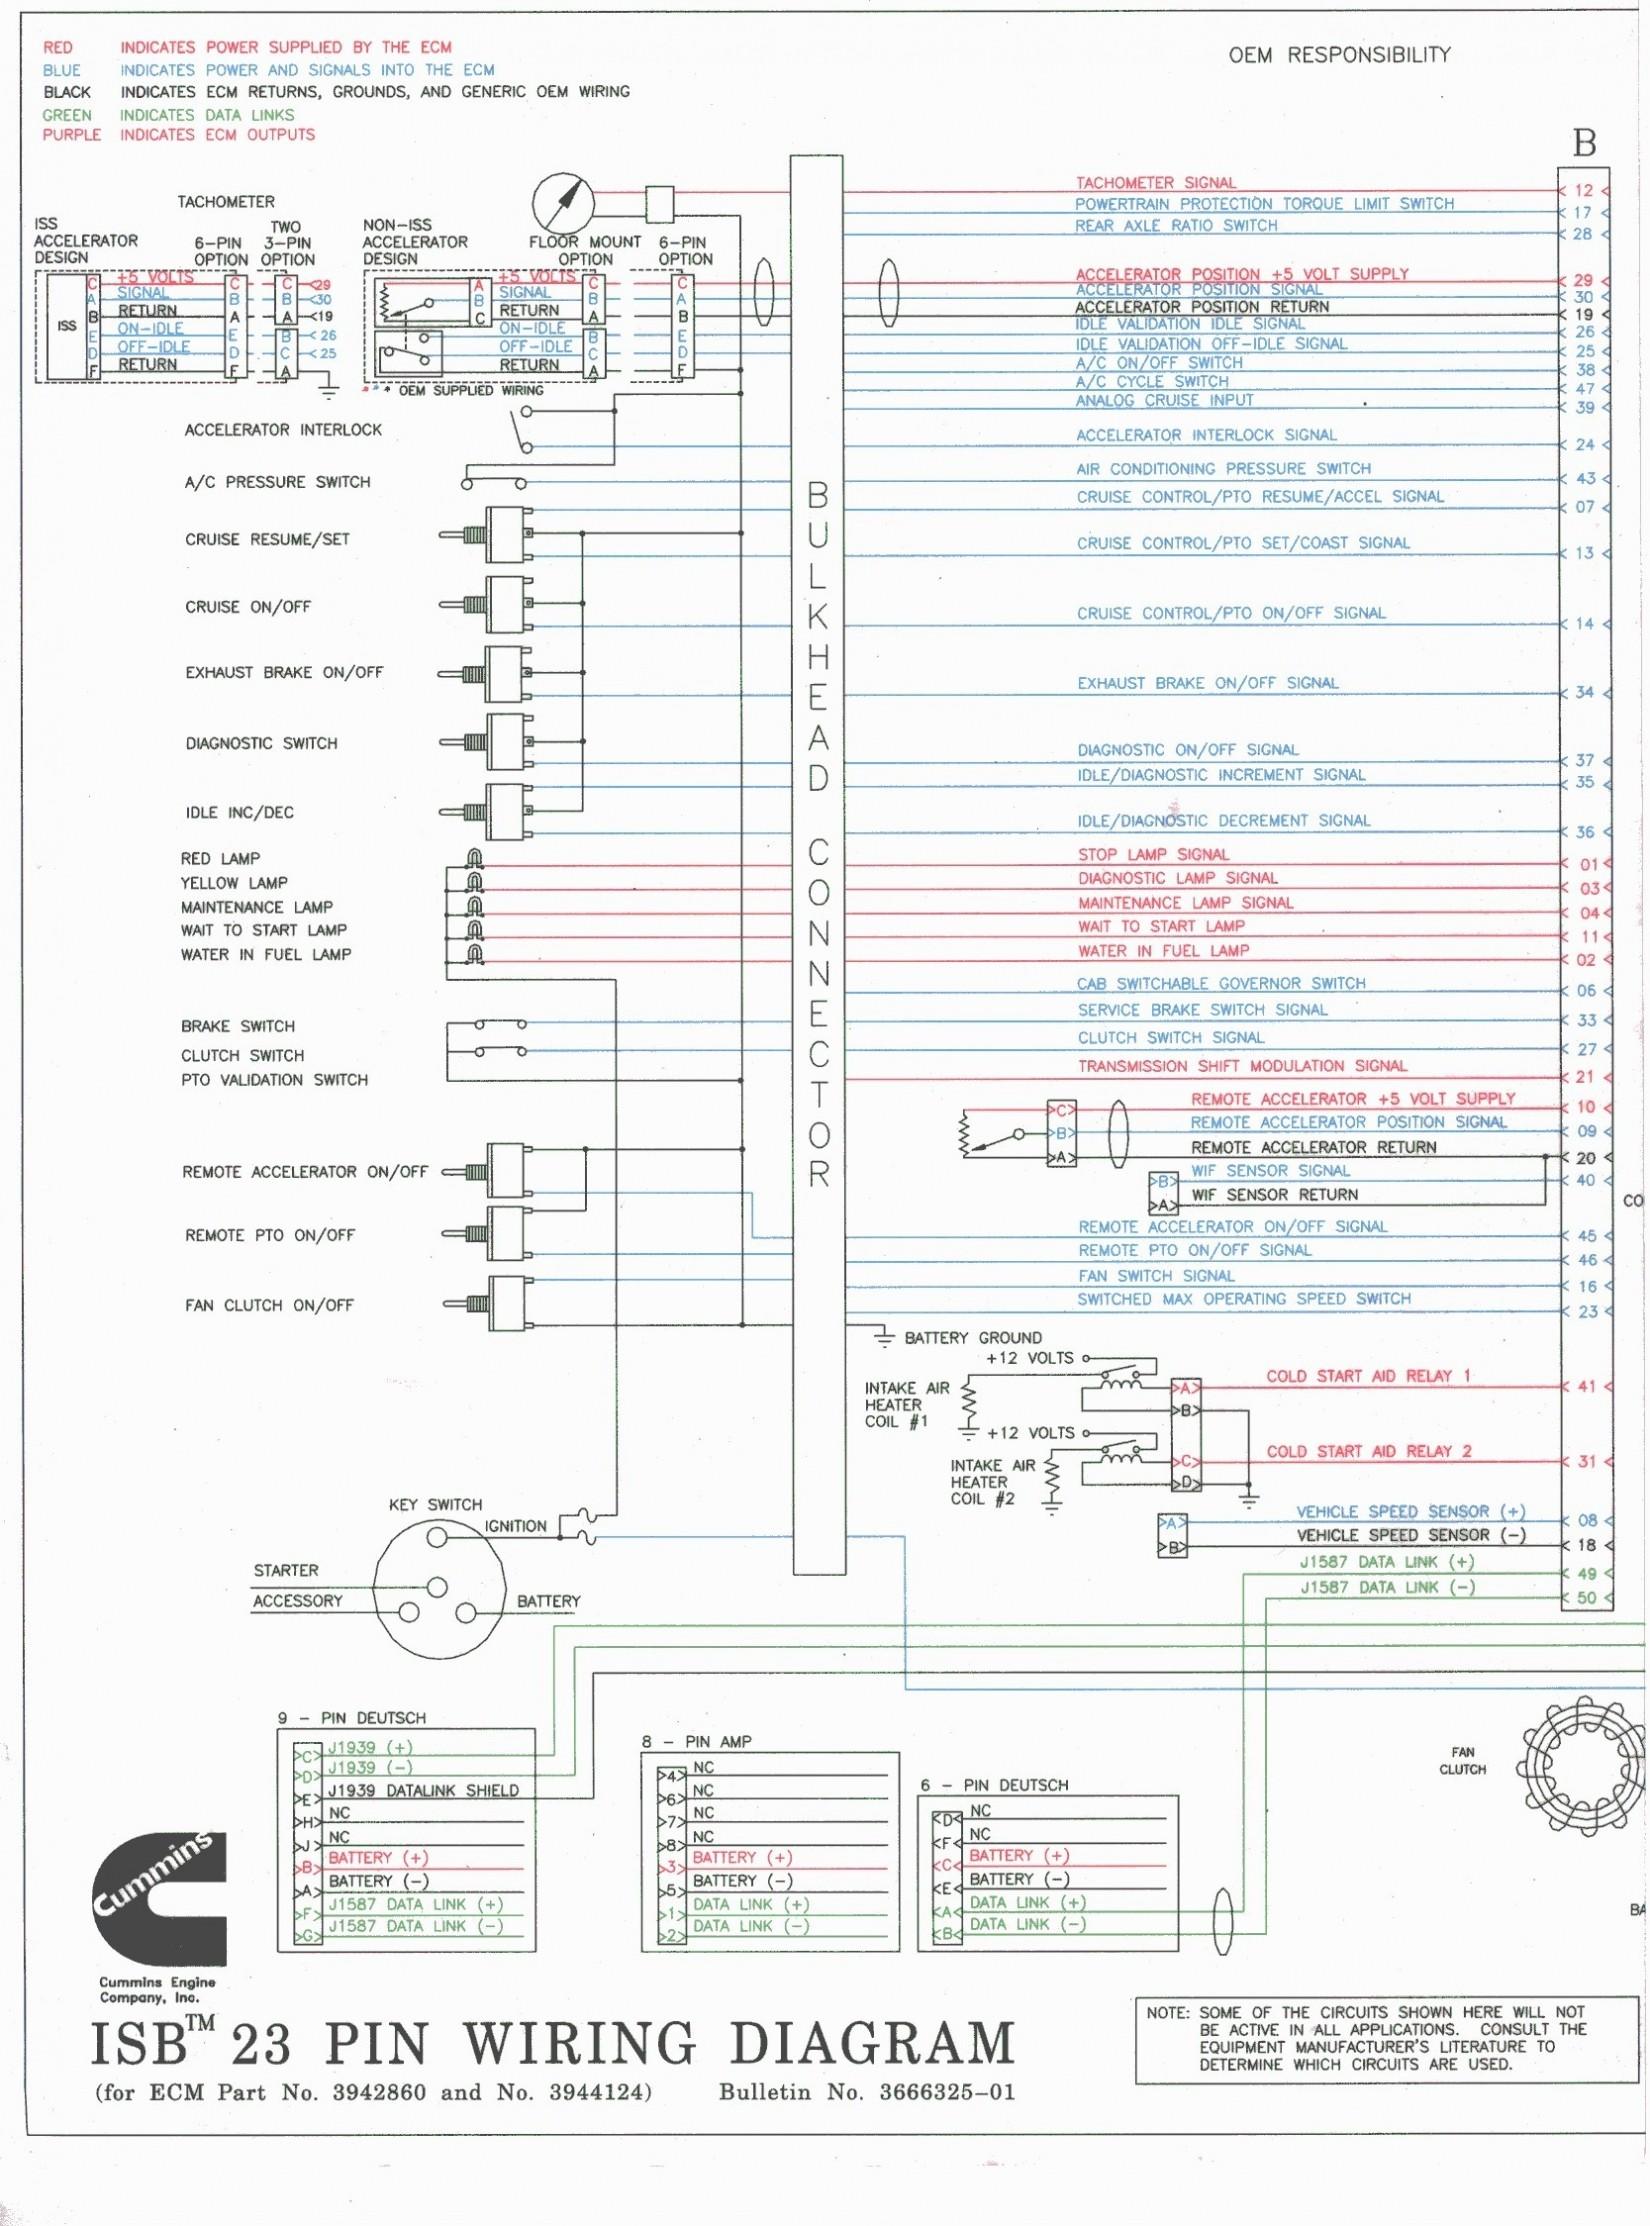 2004 Dodge Ram 1500 Wiring Diagram from detoxicrecenze.com